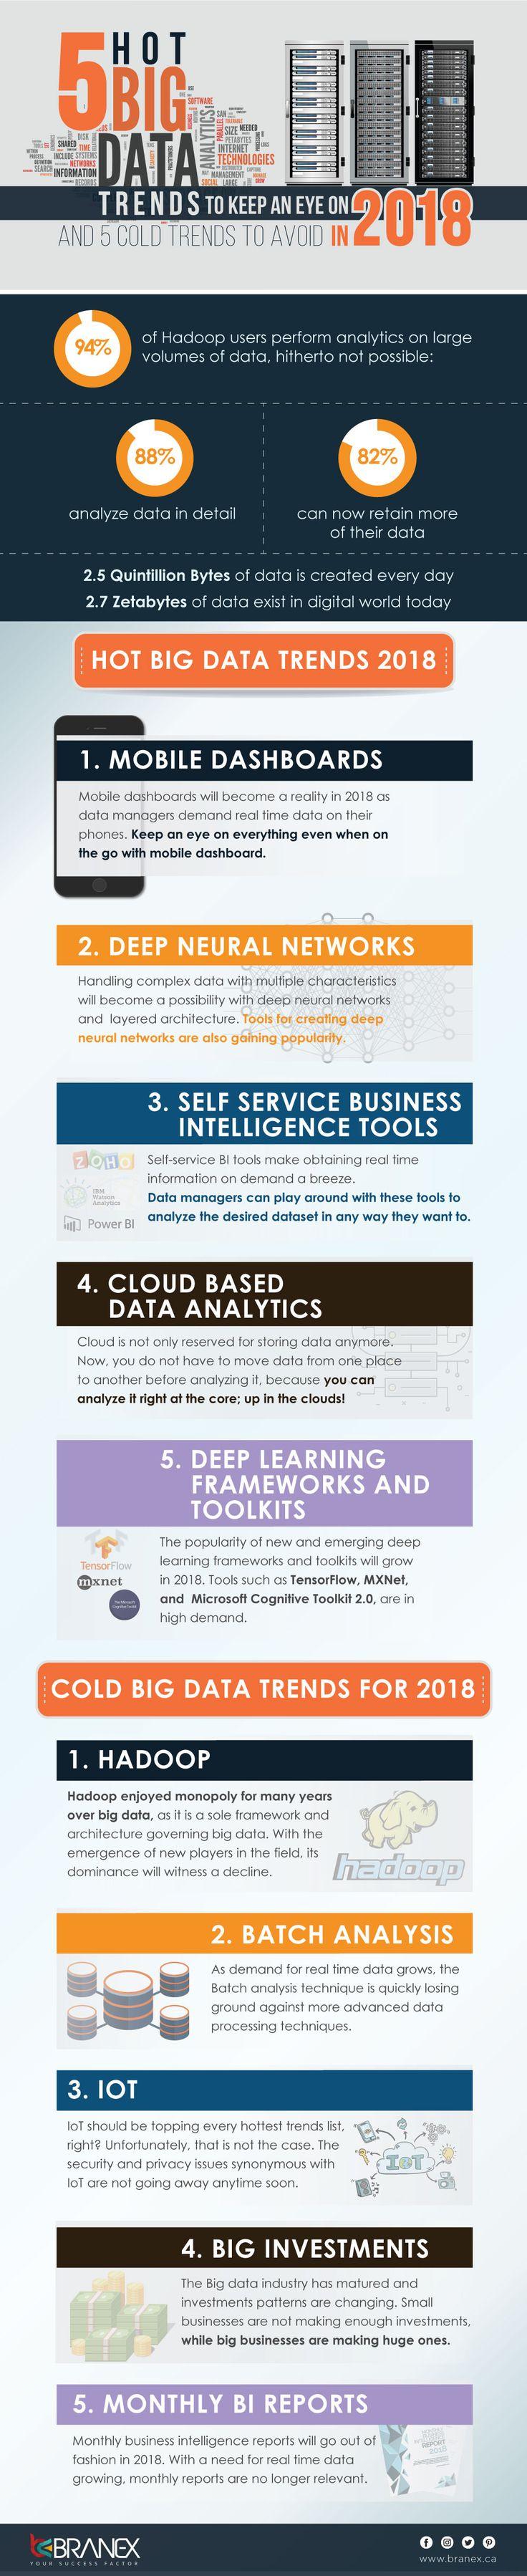 5 Hot Big Data Trends #Infographic #BigData #Trends